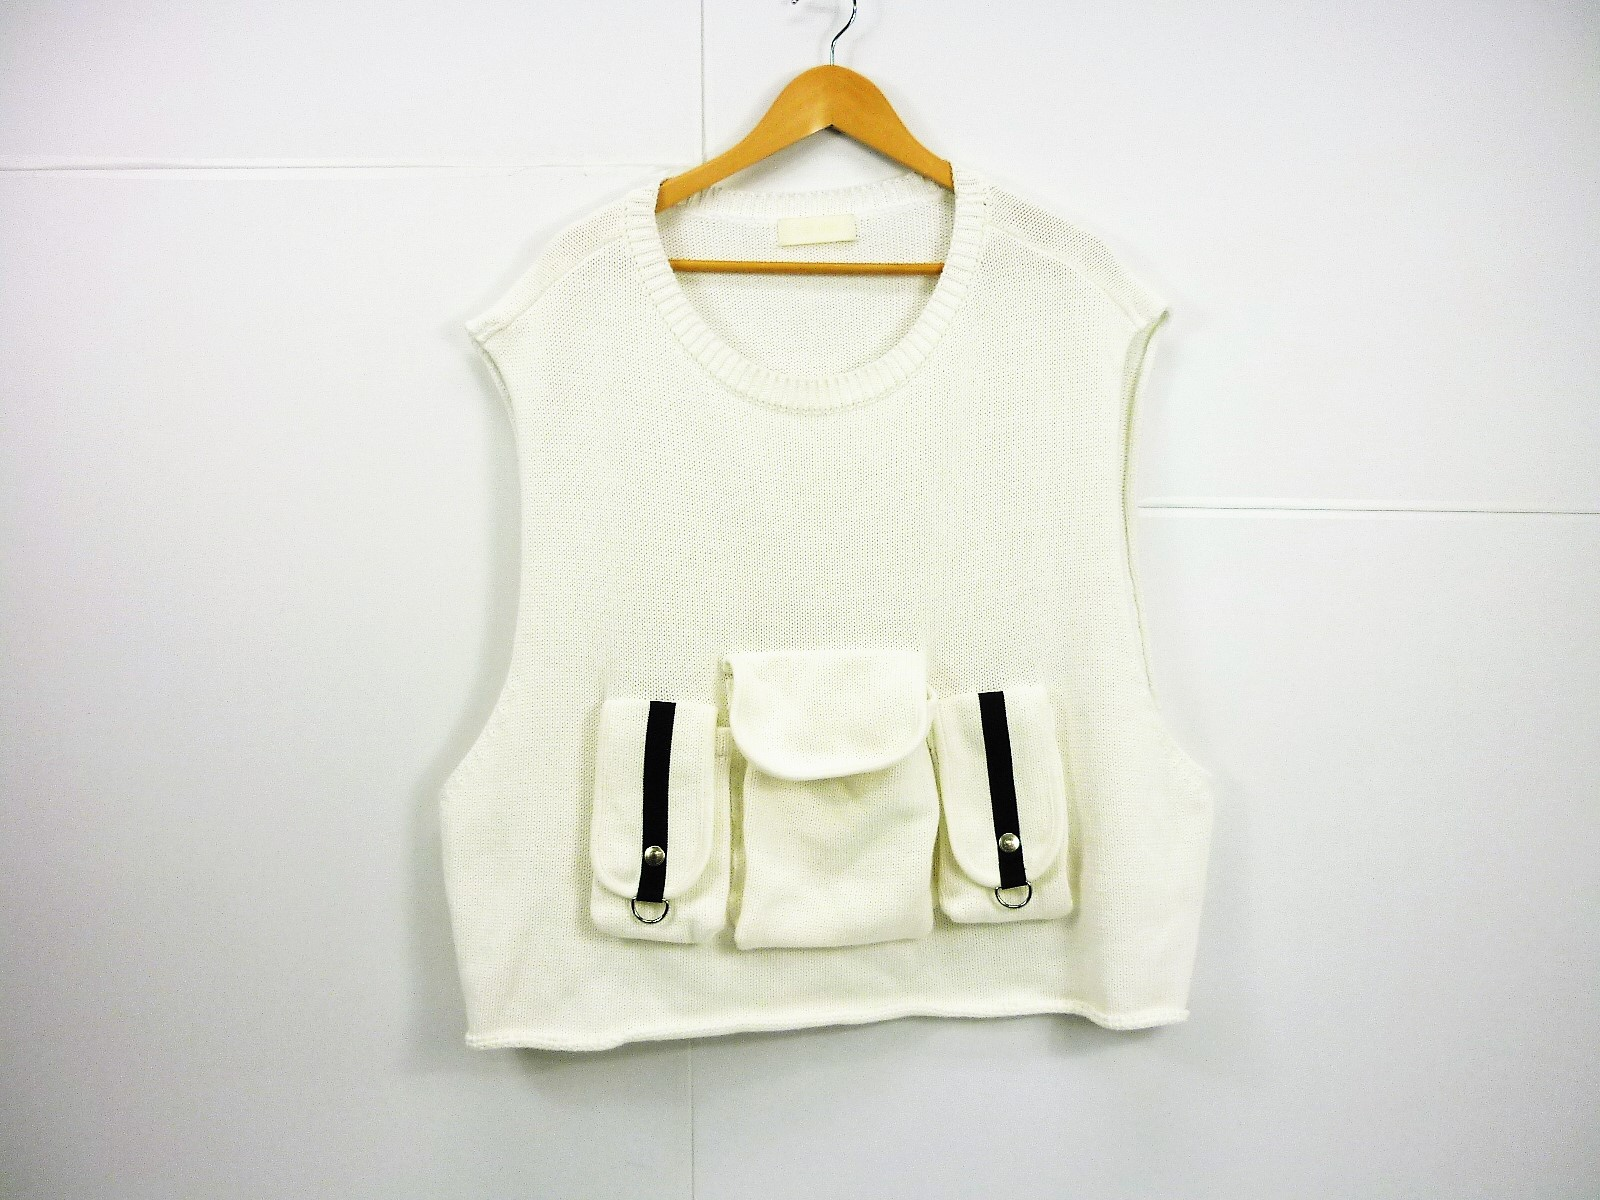 NEON SIGN BAG VEST size:46 ネオンサイン バッグベスト ホワイト 1016